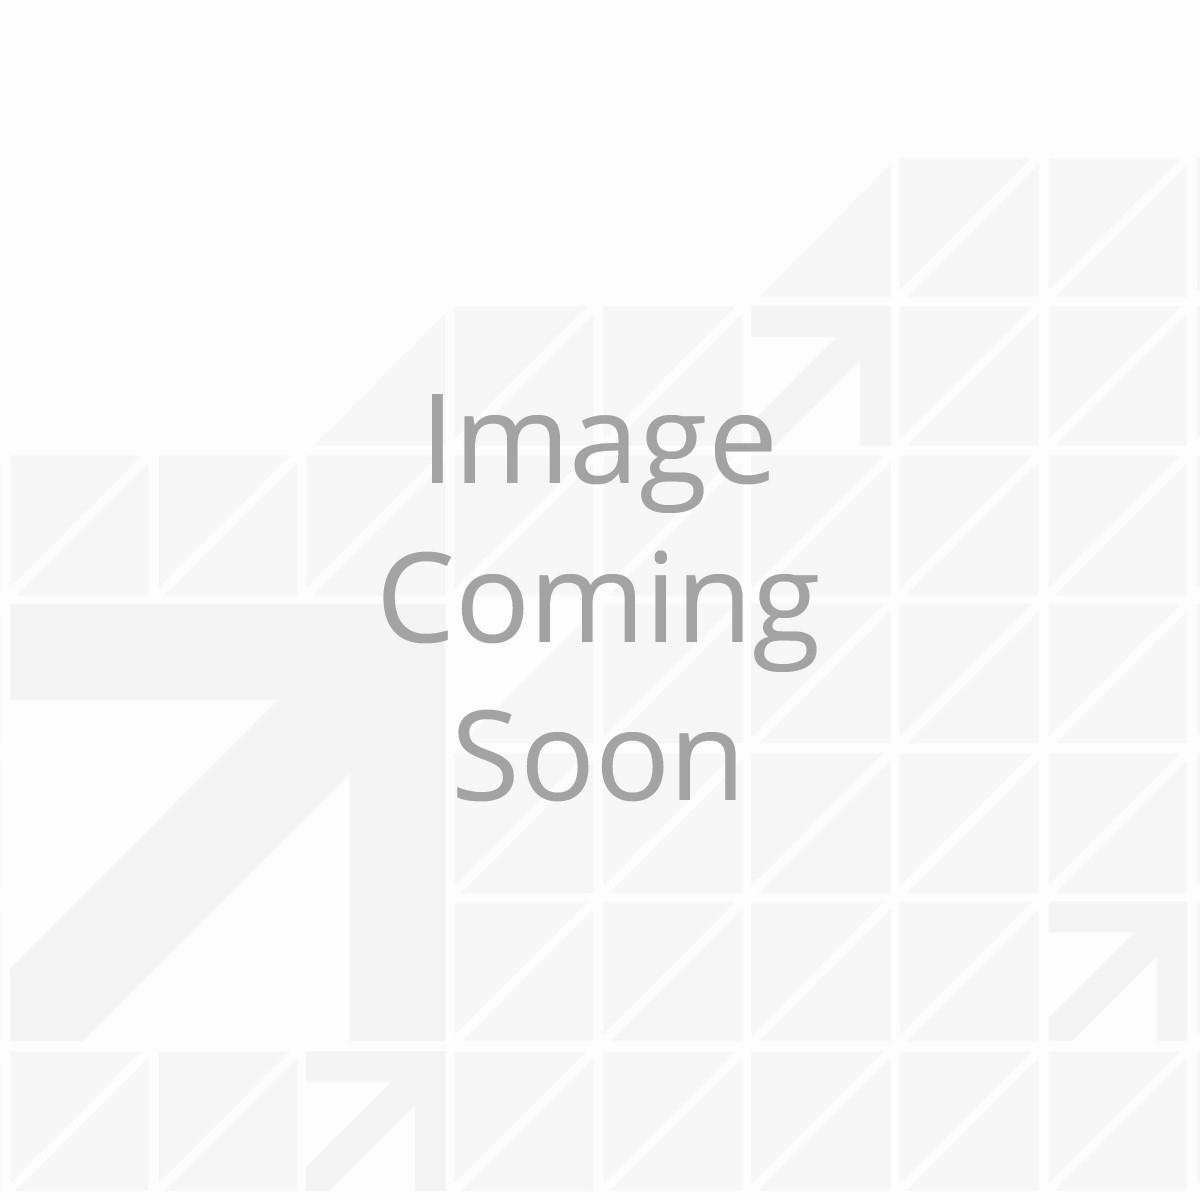 Left Hand Recliner - Seismic Series (Altoona)